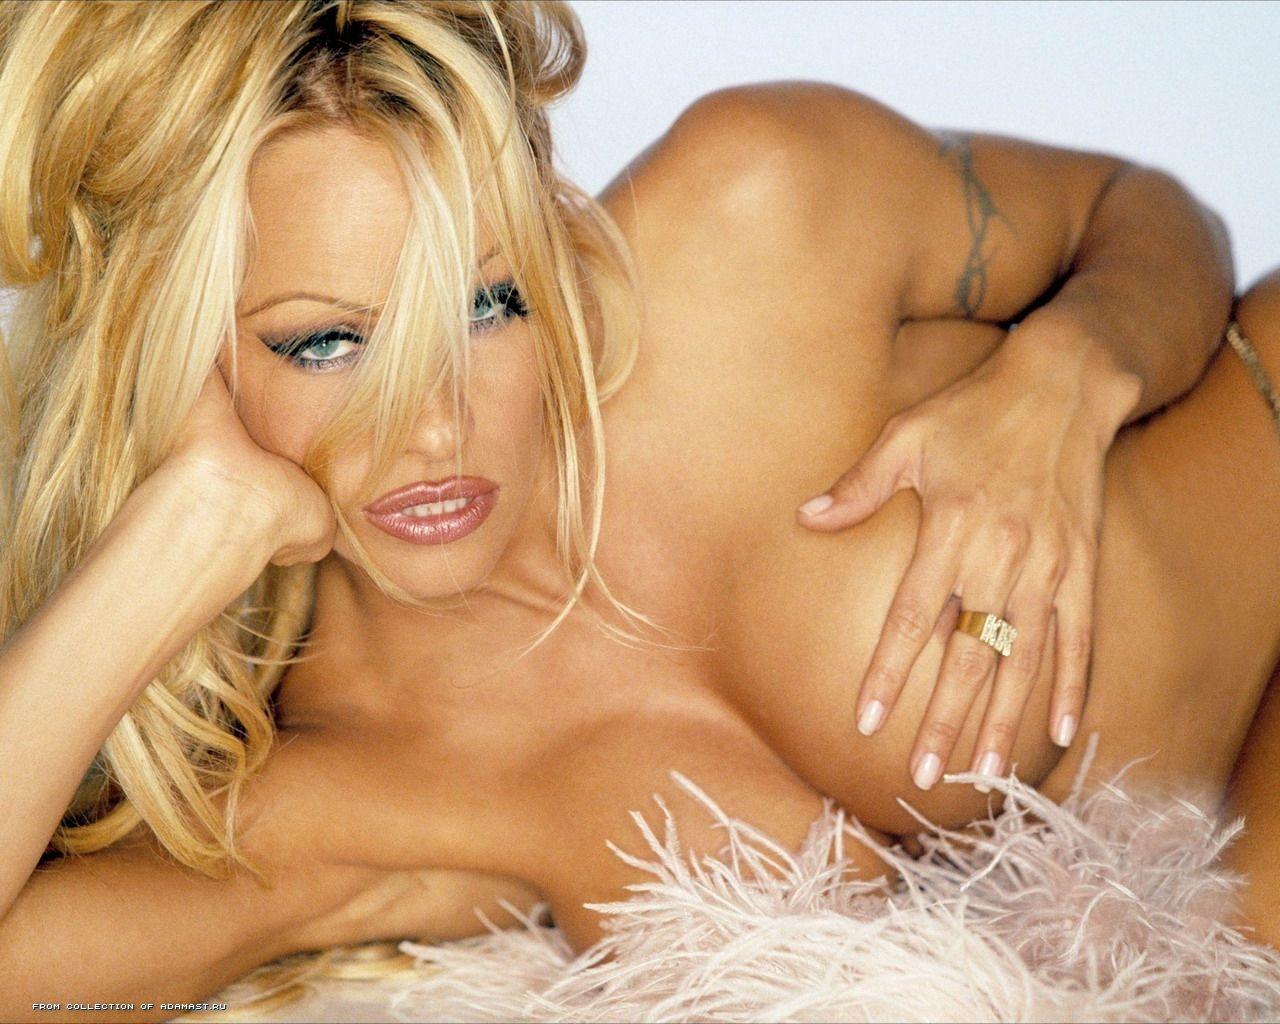 Pamela Anderson Big Tits Nude - Wallpaper pamela anderson, blonde, big titts, big boobs desktop wallpaper -  Celebrities - ID: 13162 - ftopx.com